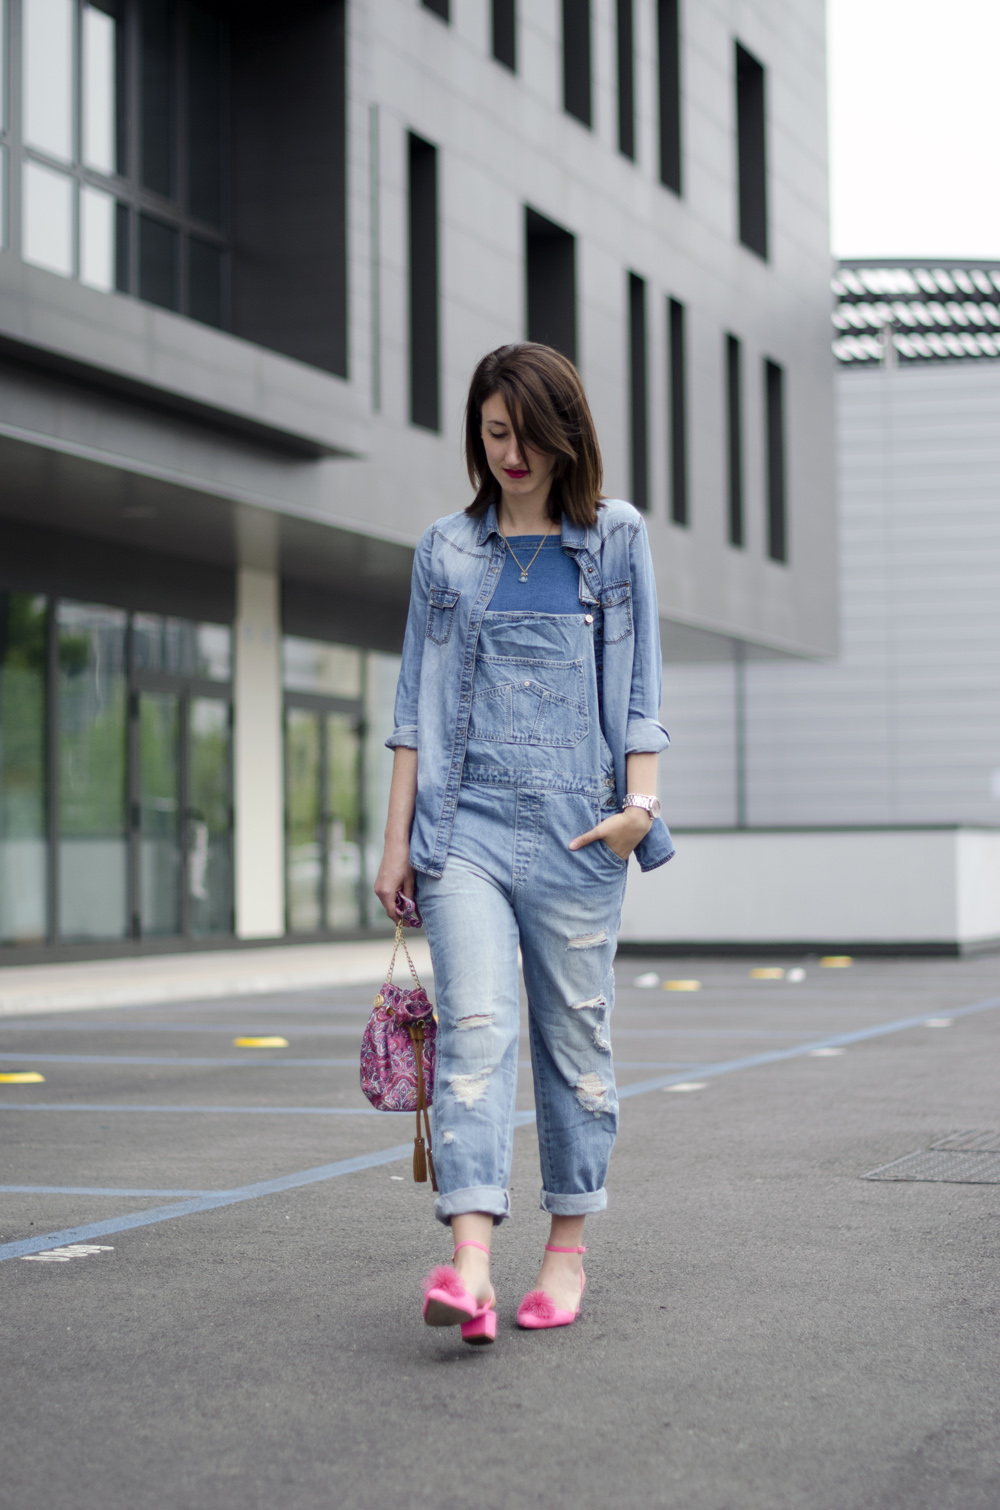 outfit total denim |salopette denim| jeans total look